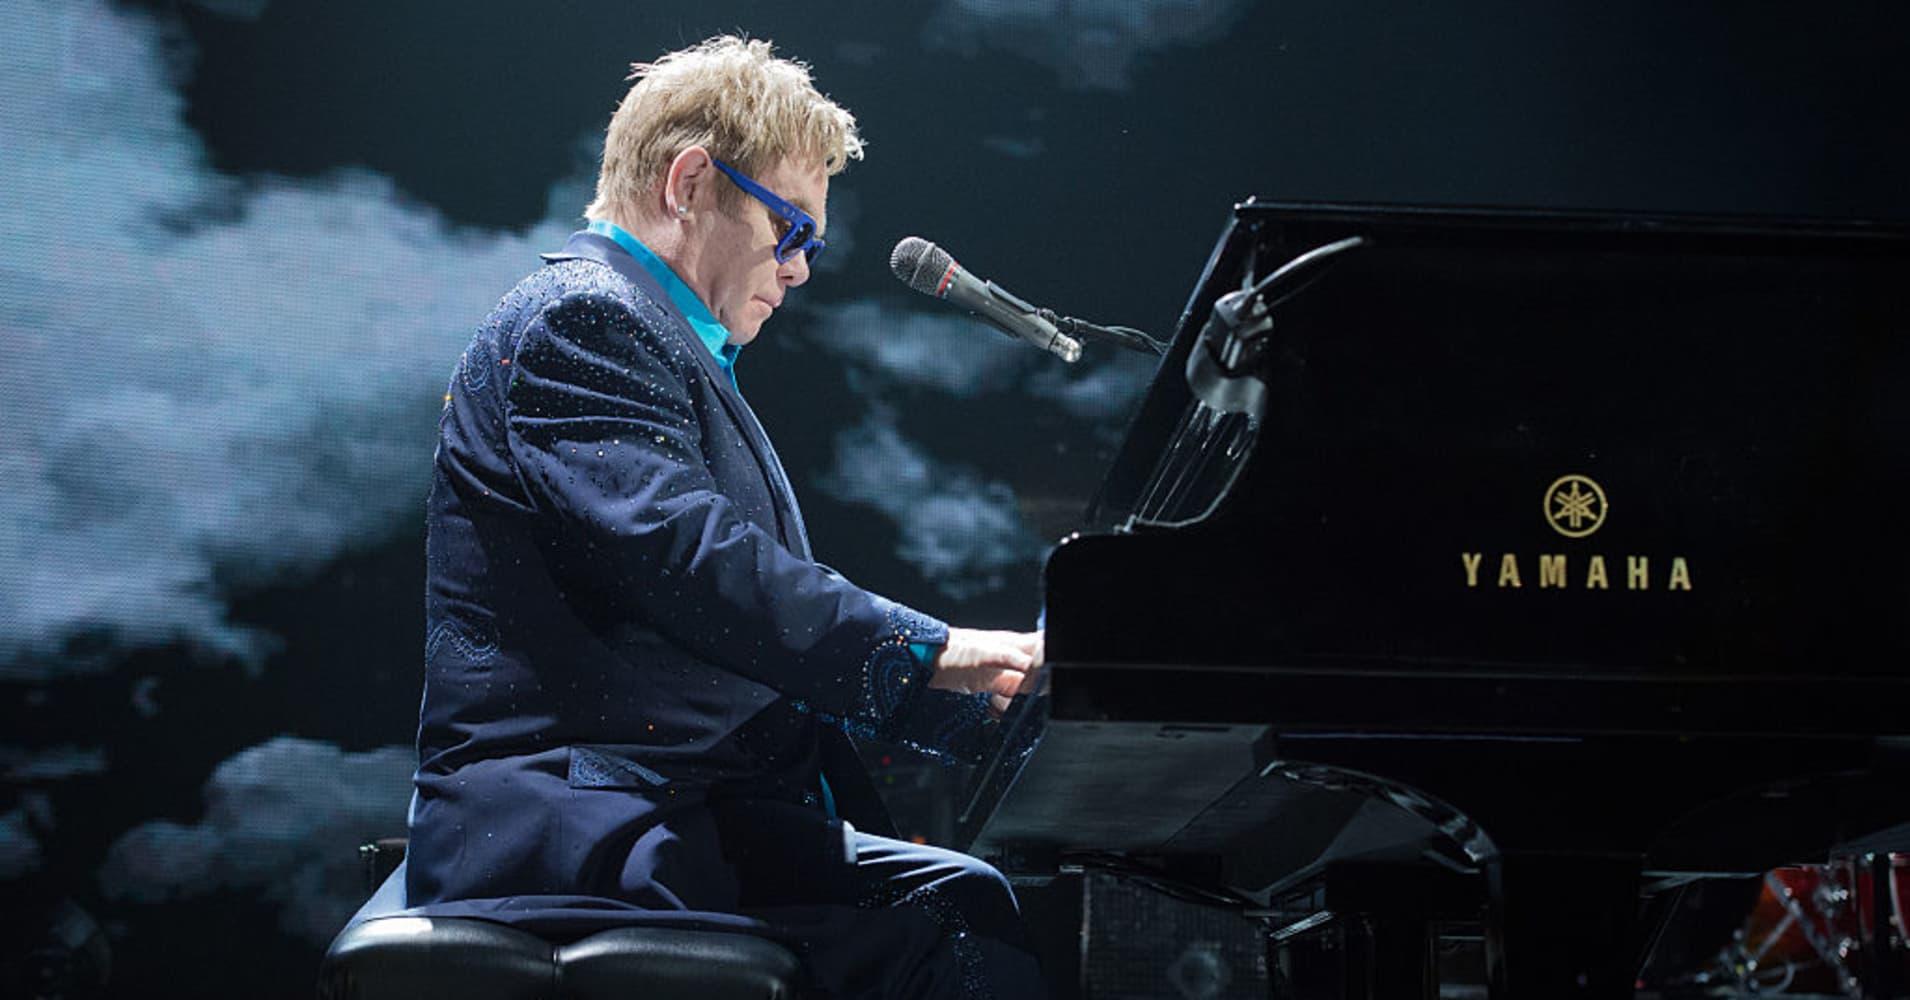 Elton John performs at Palais Omnisports de Bercy on November 19, 2014 in Paris, France